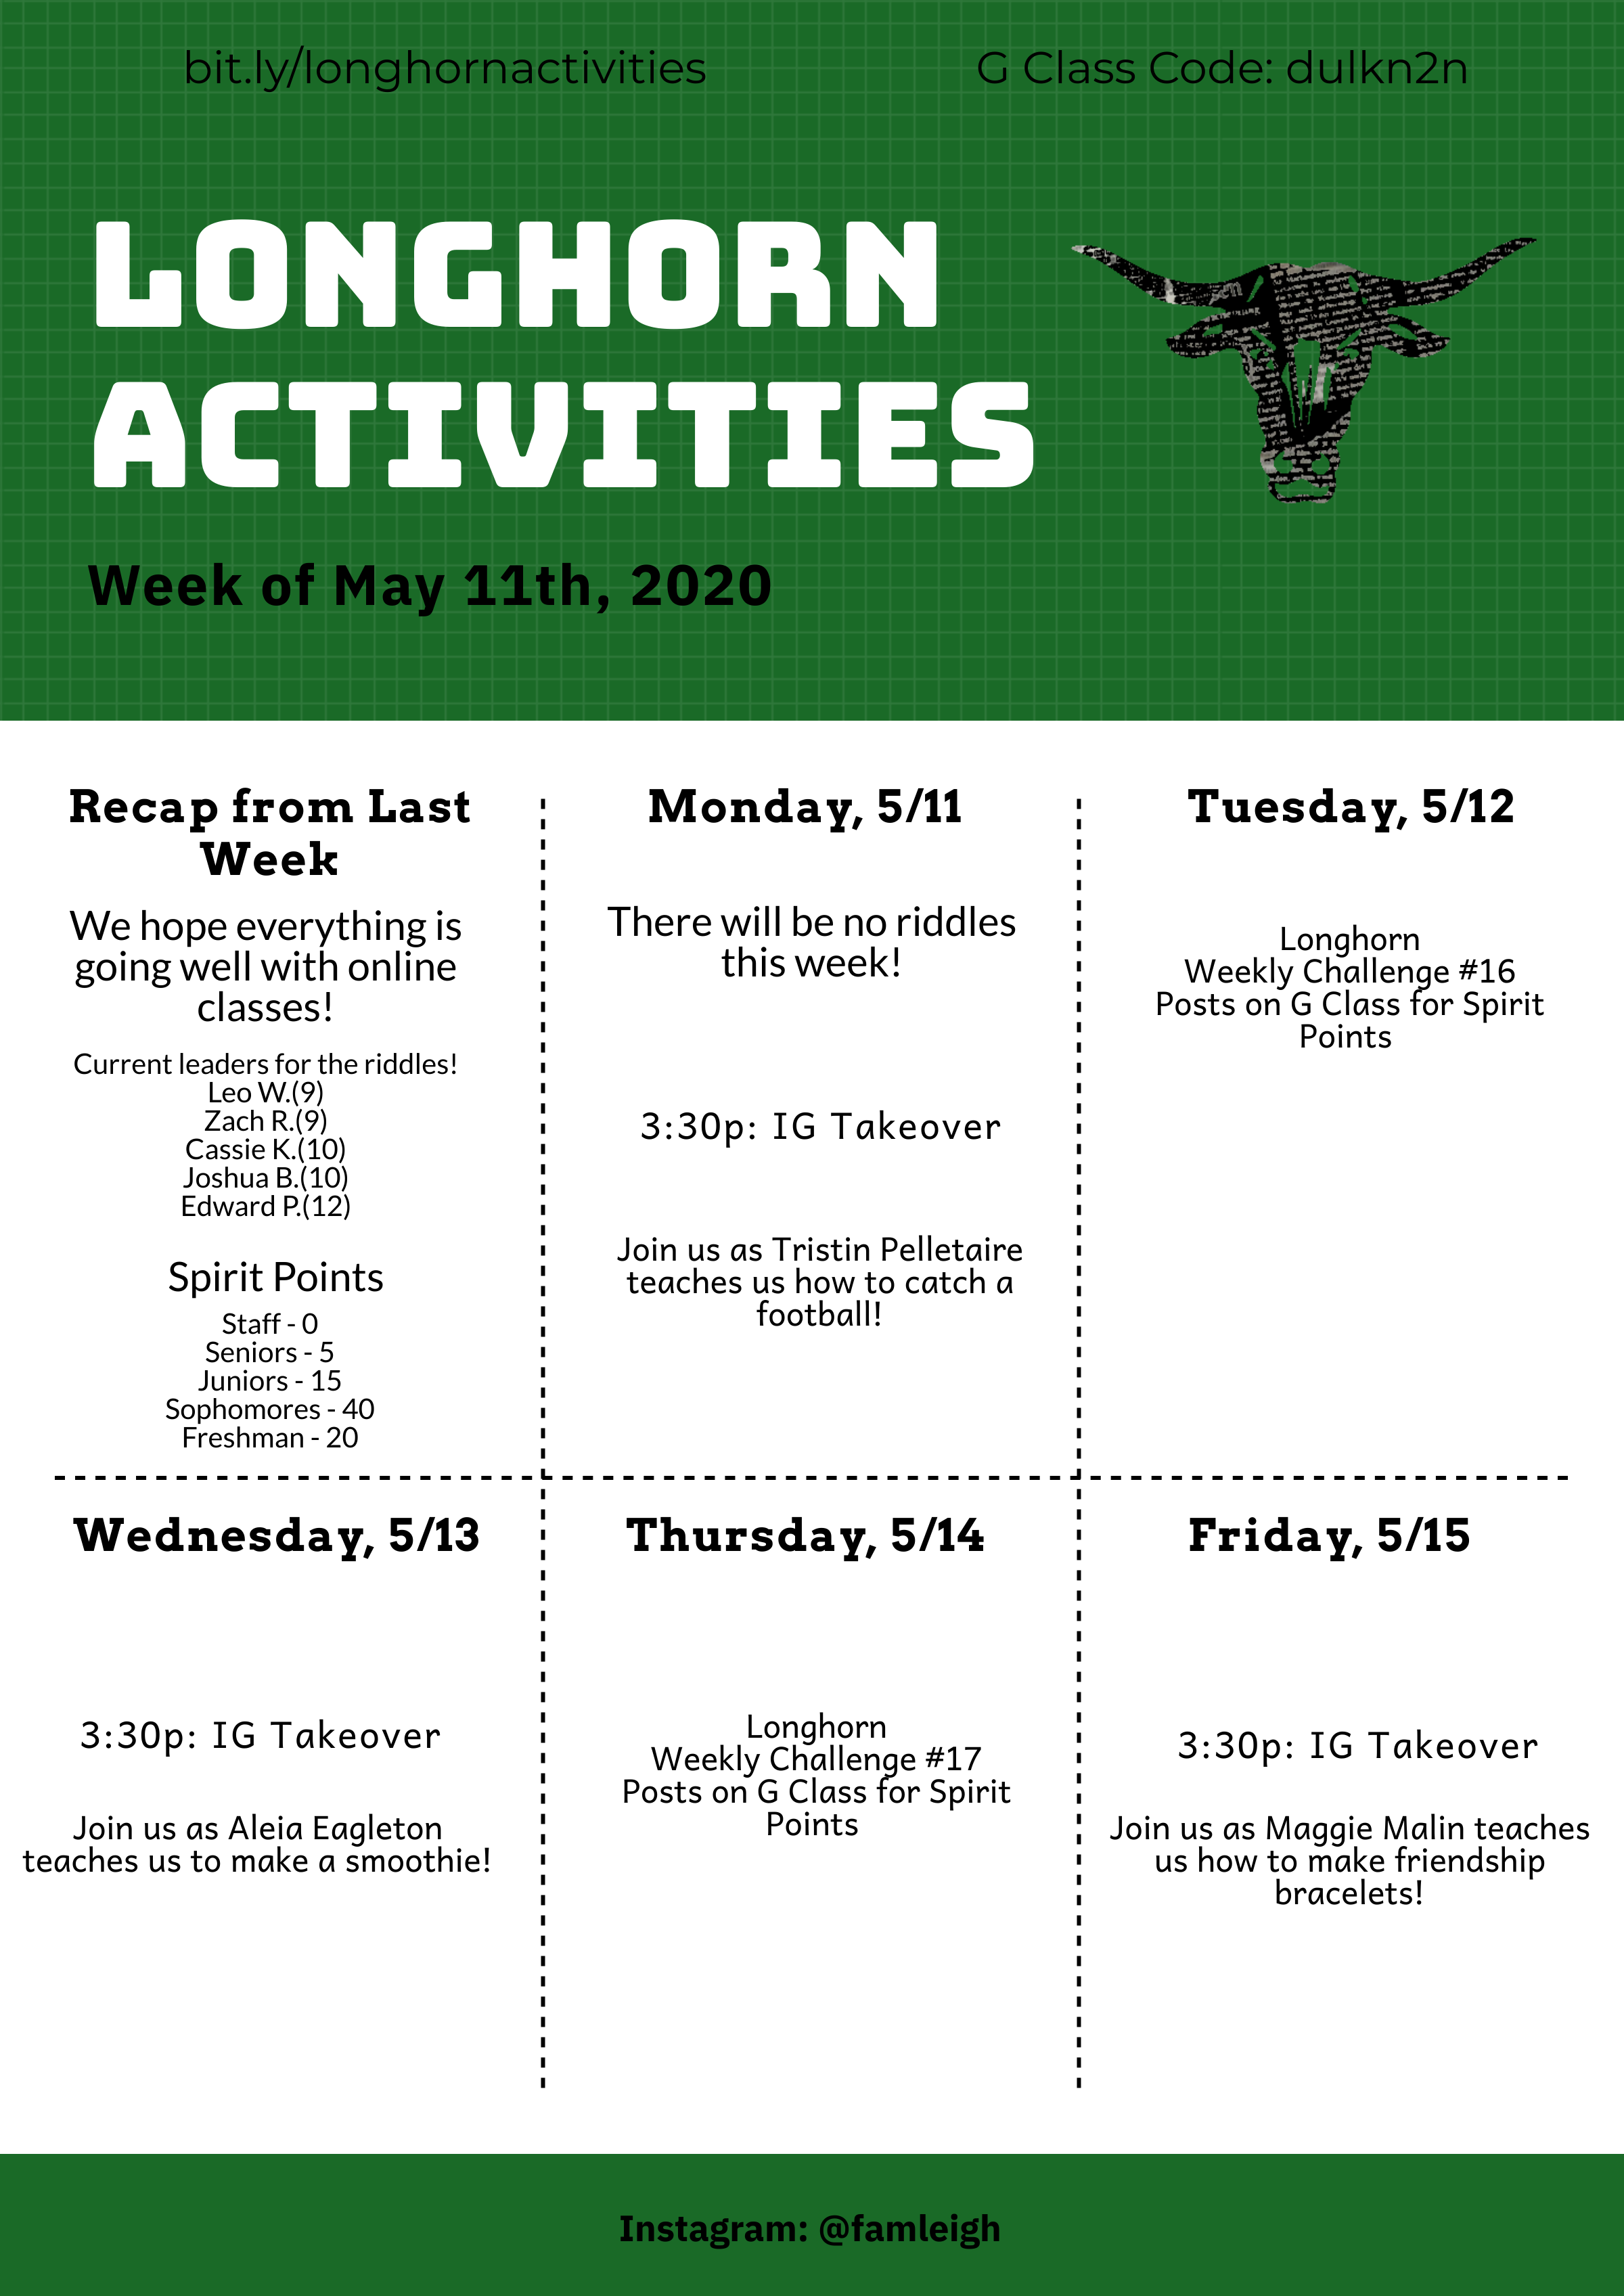 Activities Week of May 11th